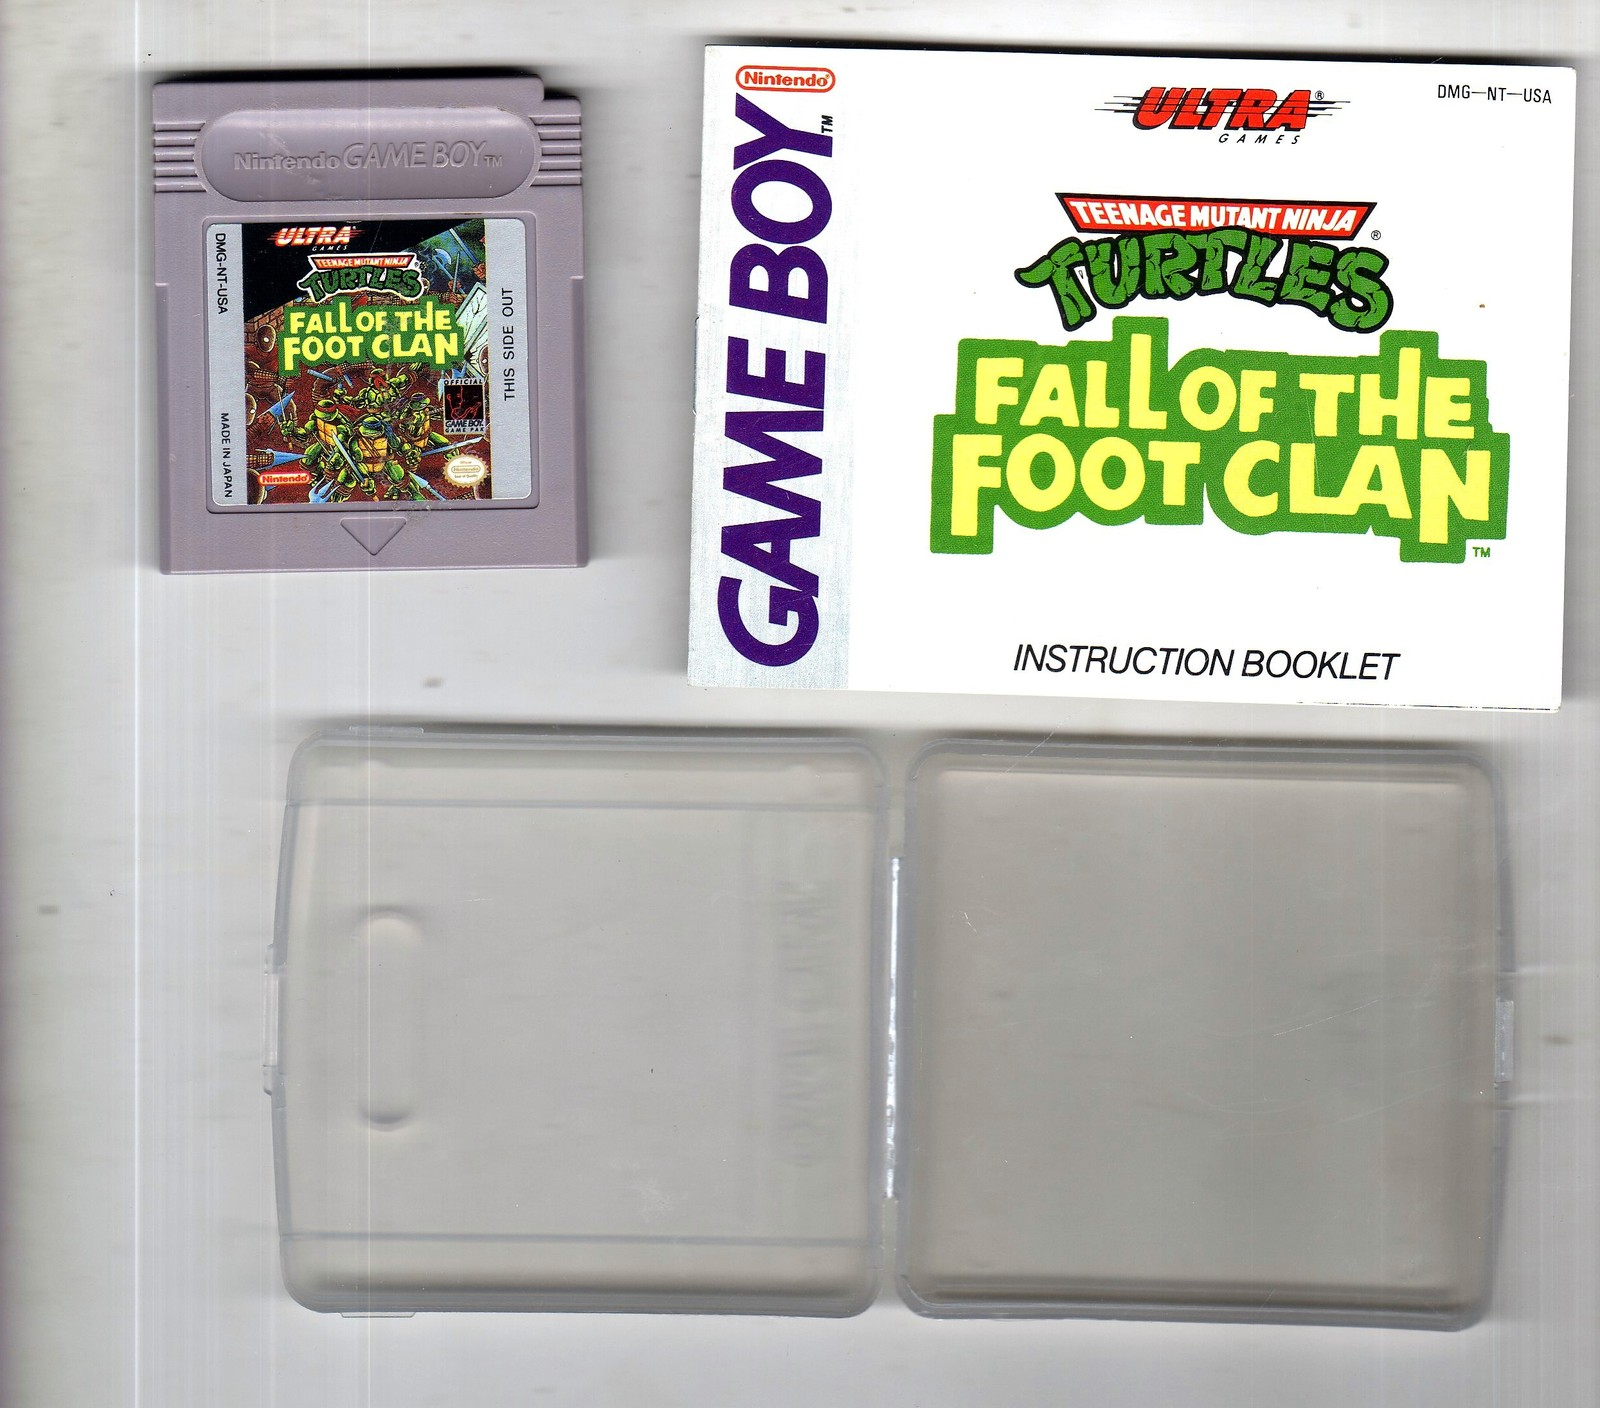 Teenage Mutant Ninja Turtles Fall of the Foot Clan Nintendo Game Boy